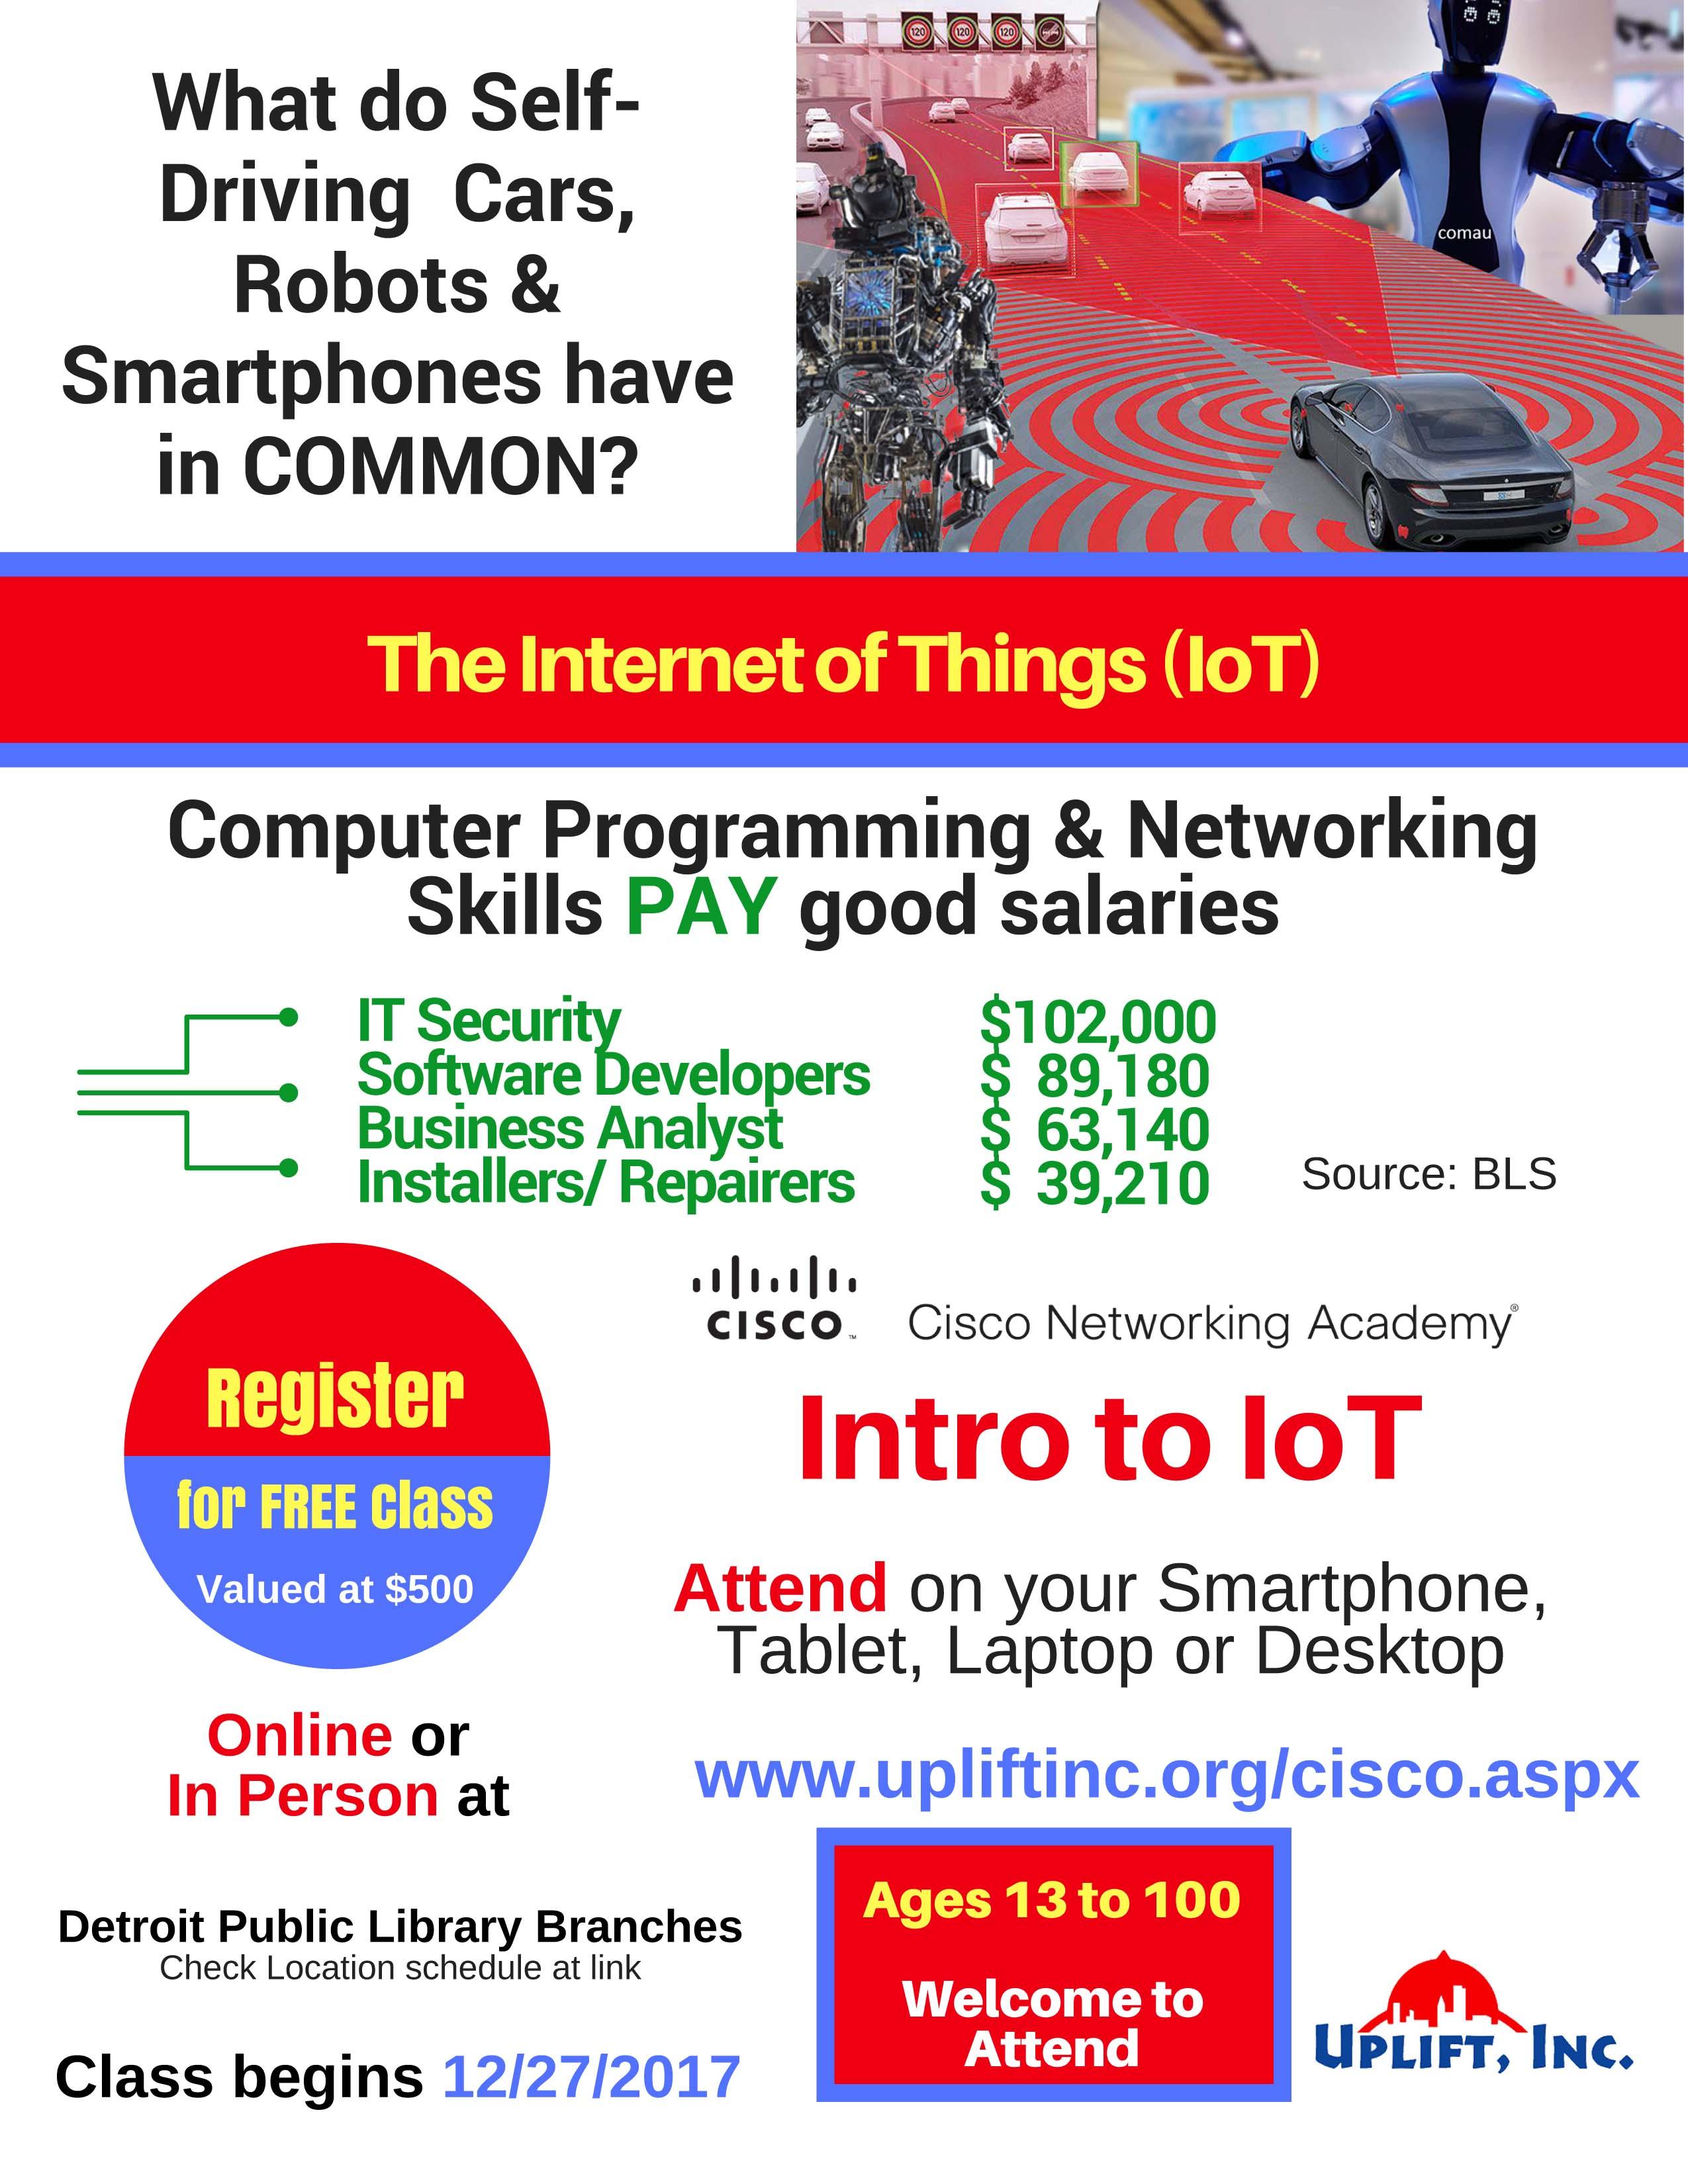 Cisco IoT (Internet of Things) Class